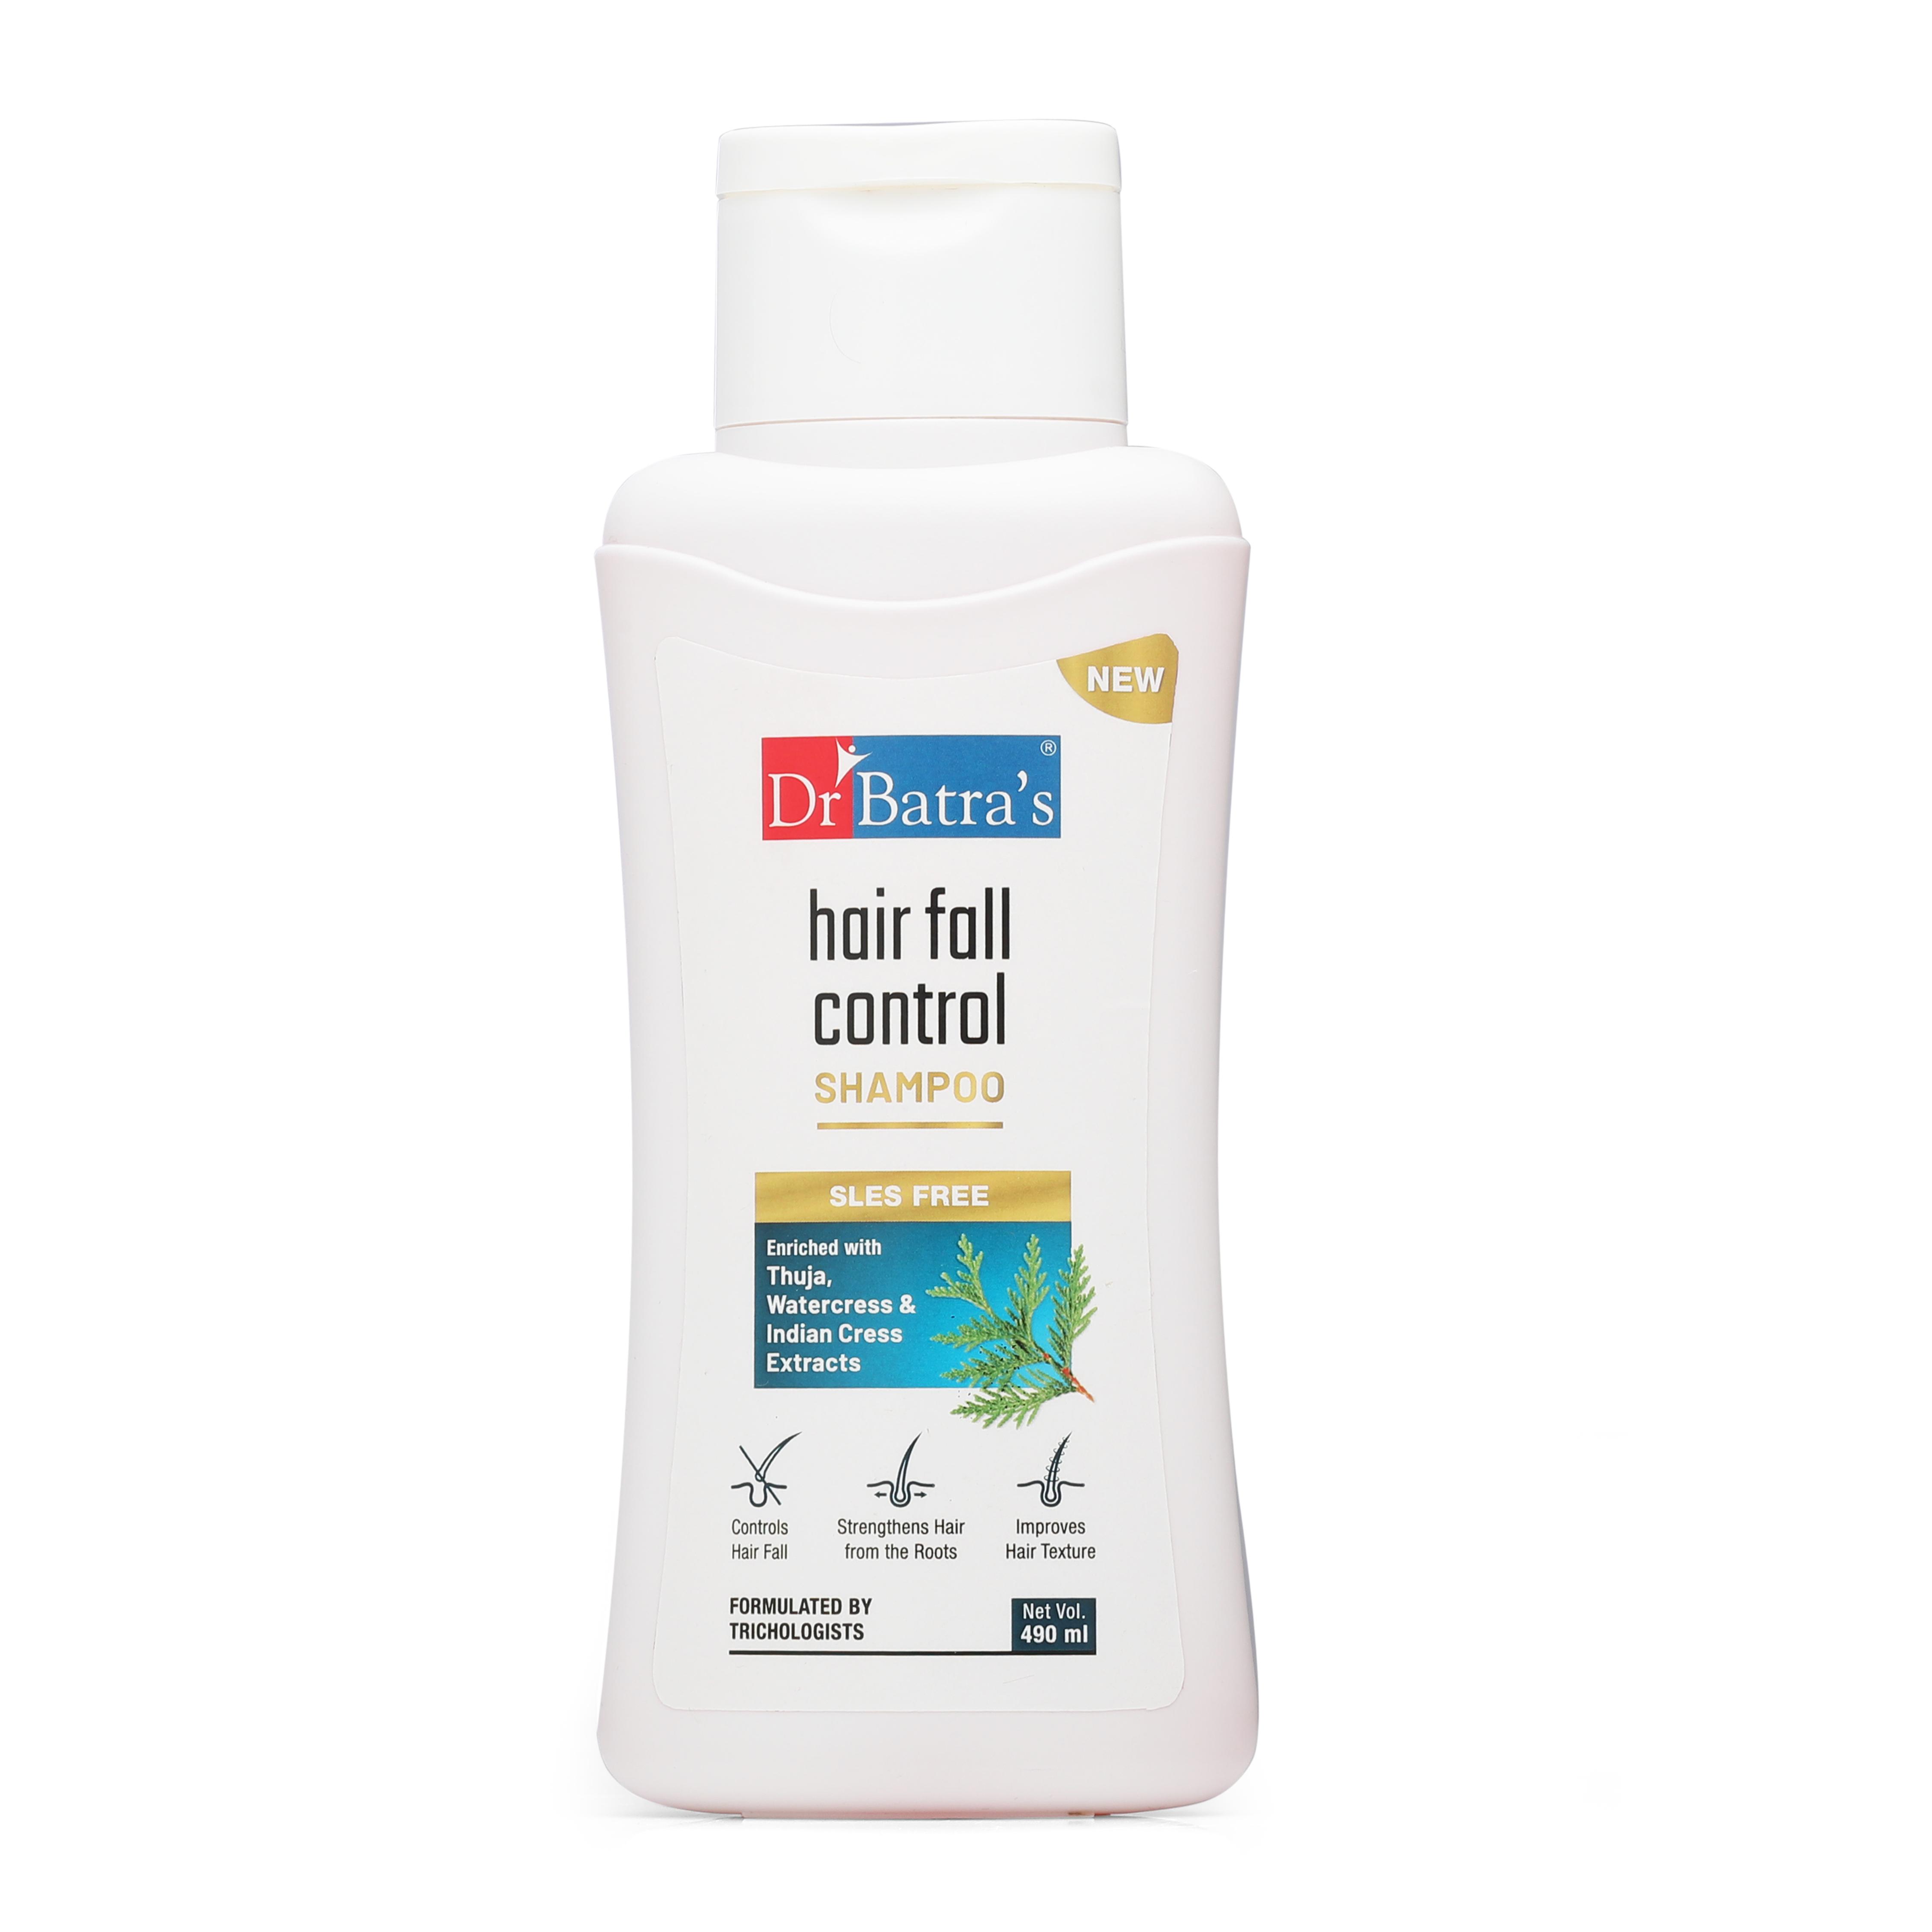 Dr Batra's | Dr Batra's Hair Fall Control Shampoo - 490 ml